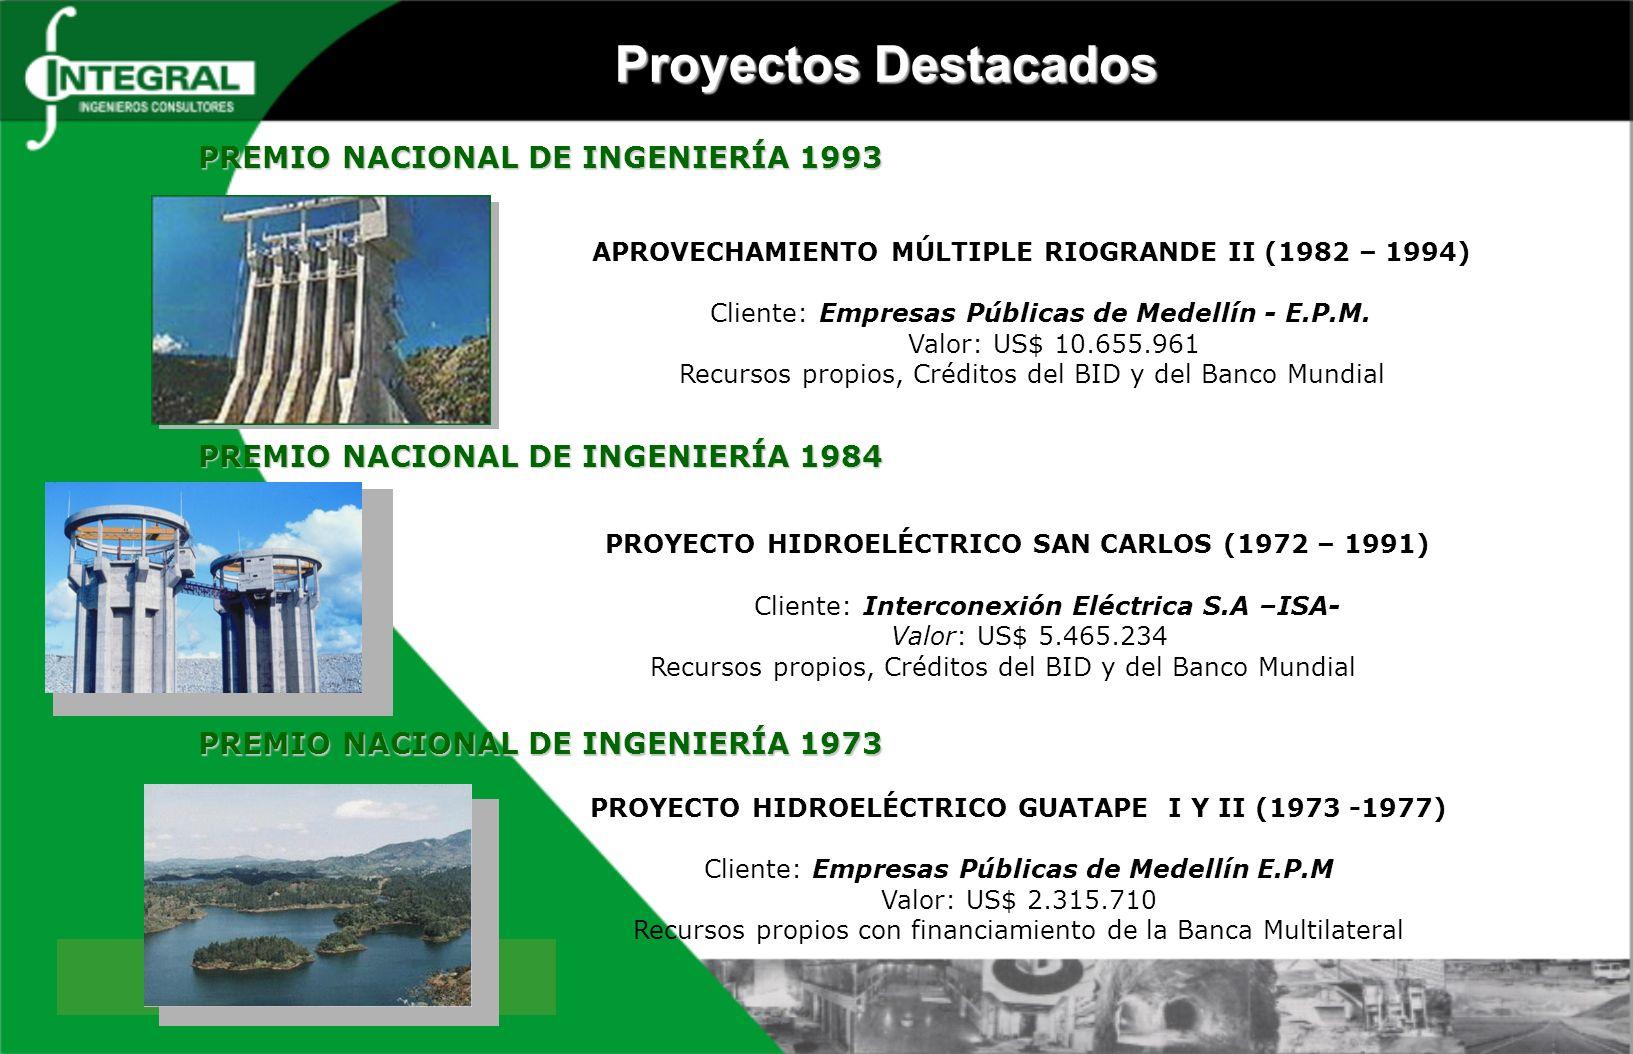 APROVECHAMIENTO MÚLTIPLE RIOGRANDE II (1982 – 1994) Cliente: Empresas Públicas de Medellín - E.P.M. Valor: US$ 10.655.961 Recursos propios, Créditos d